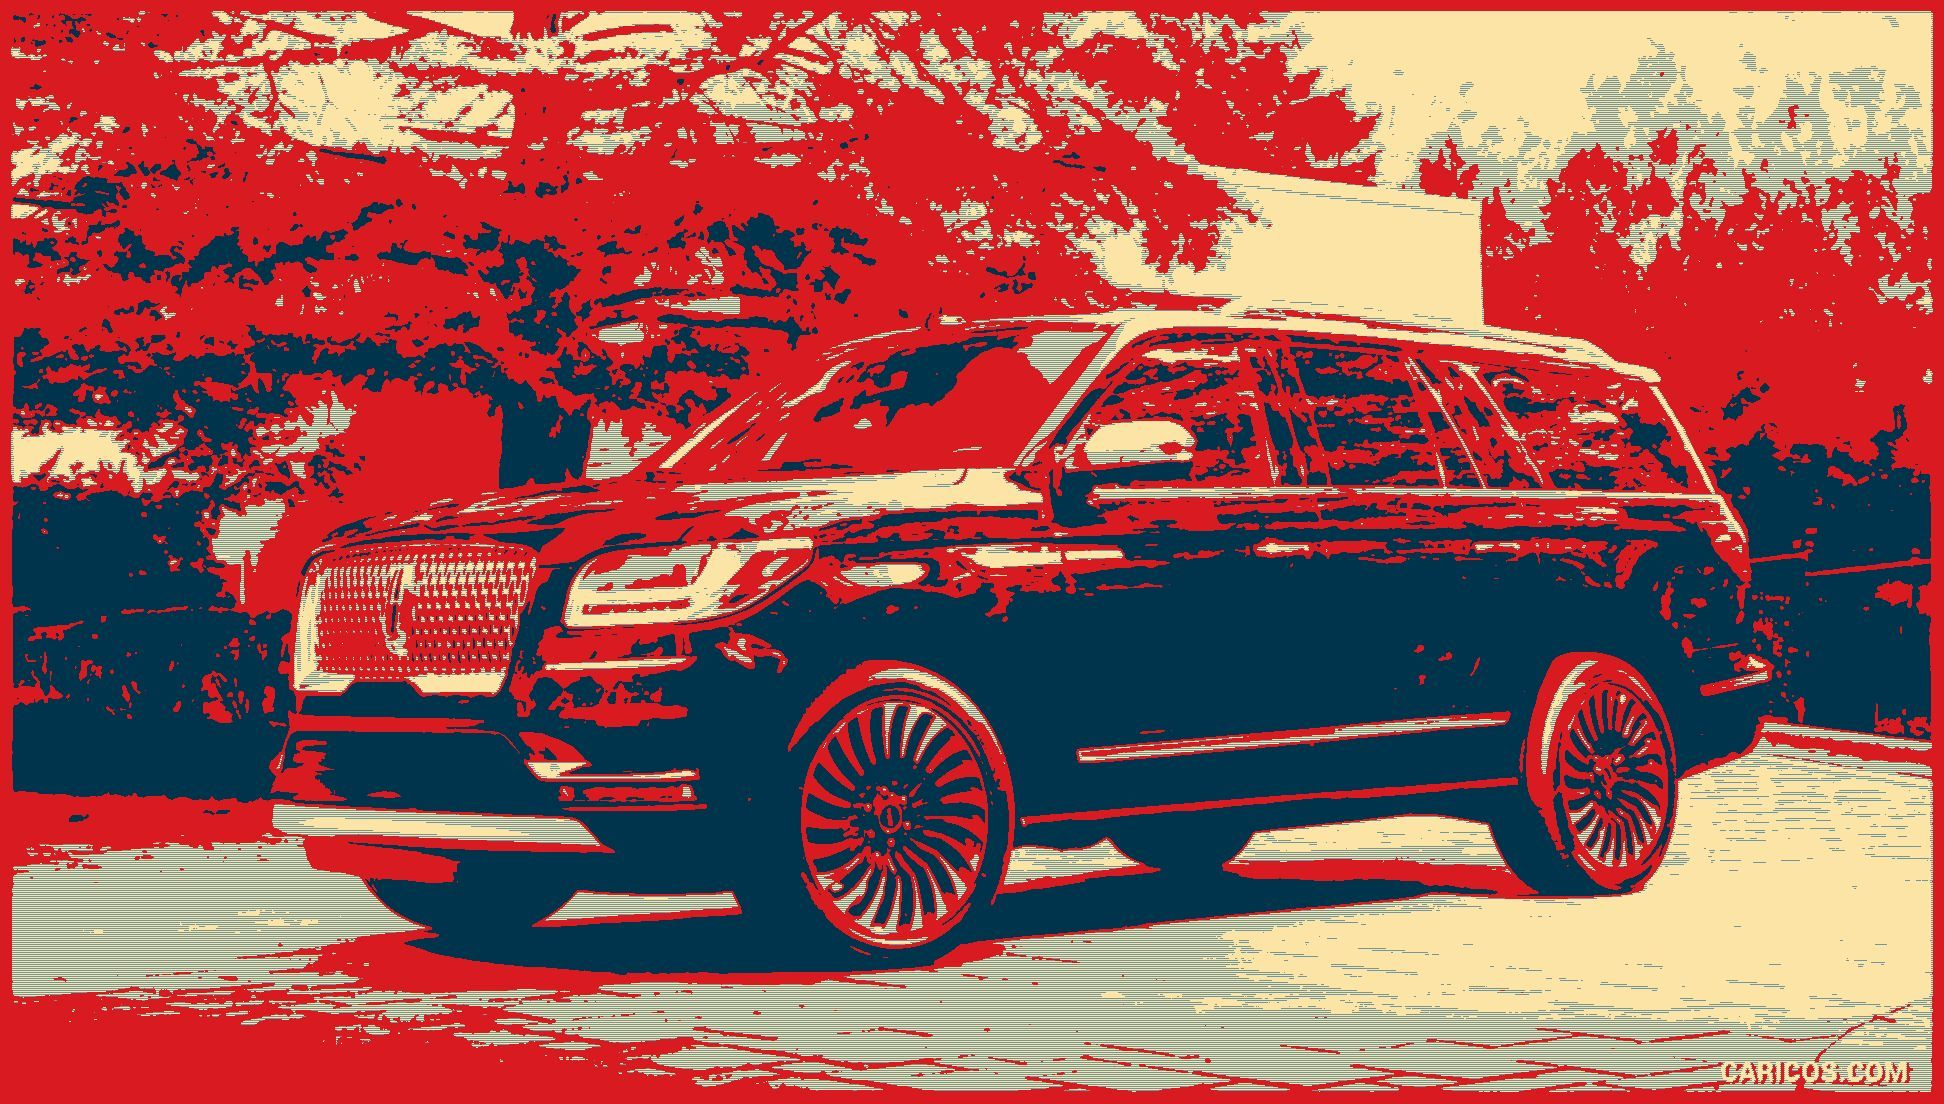 2019 Lincoln Lease Deals Lease deals, Nissan armada